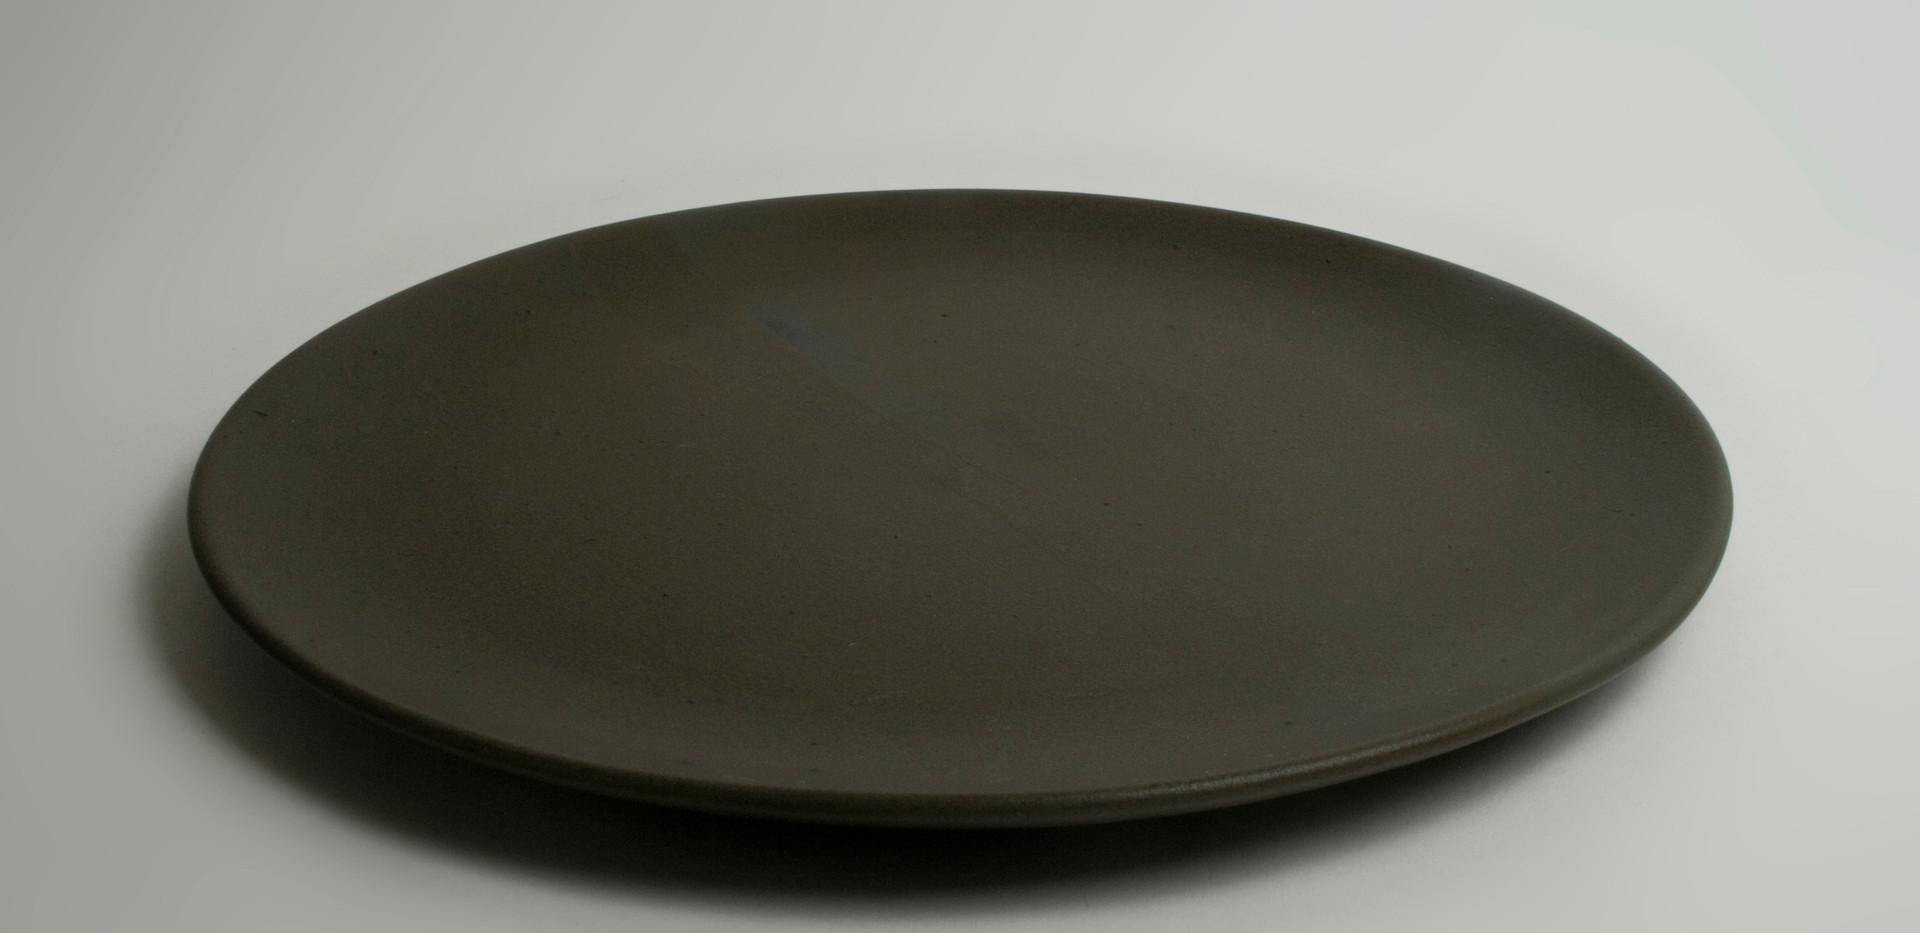 The Good Plate_dinner plate_black_Image_